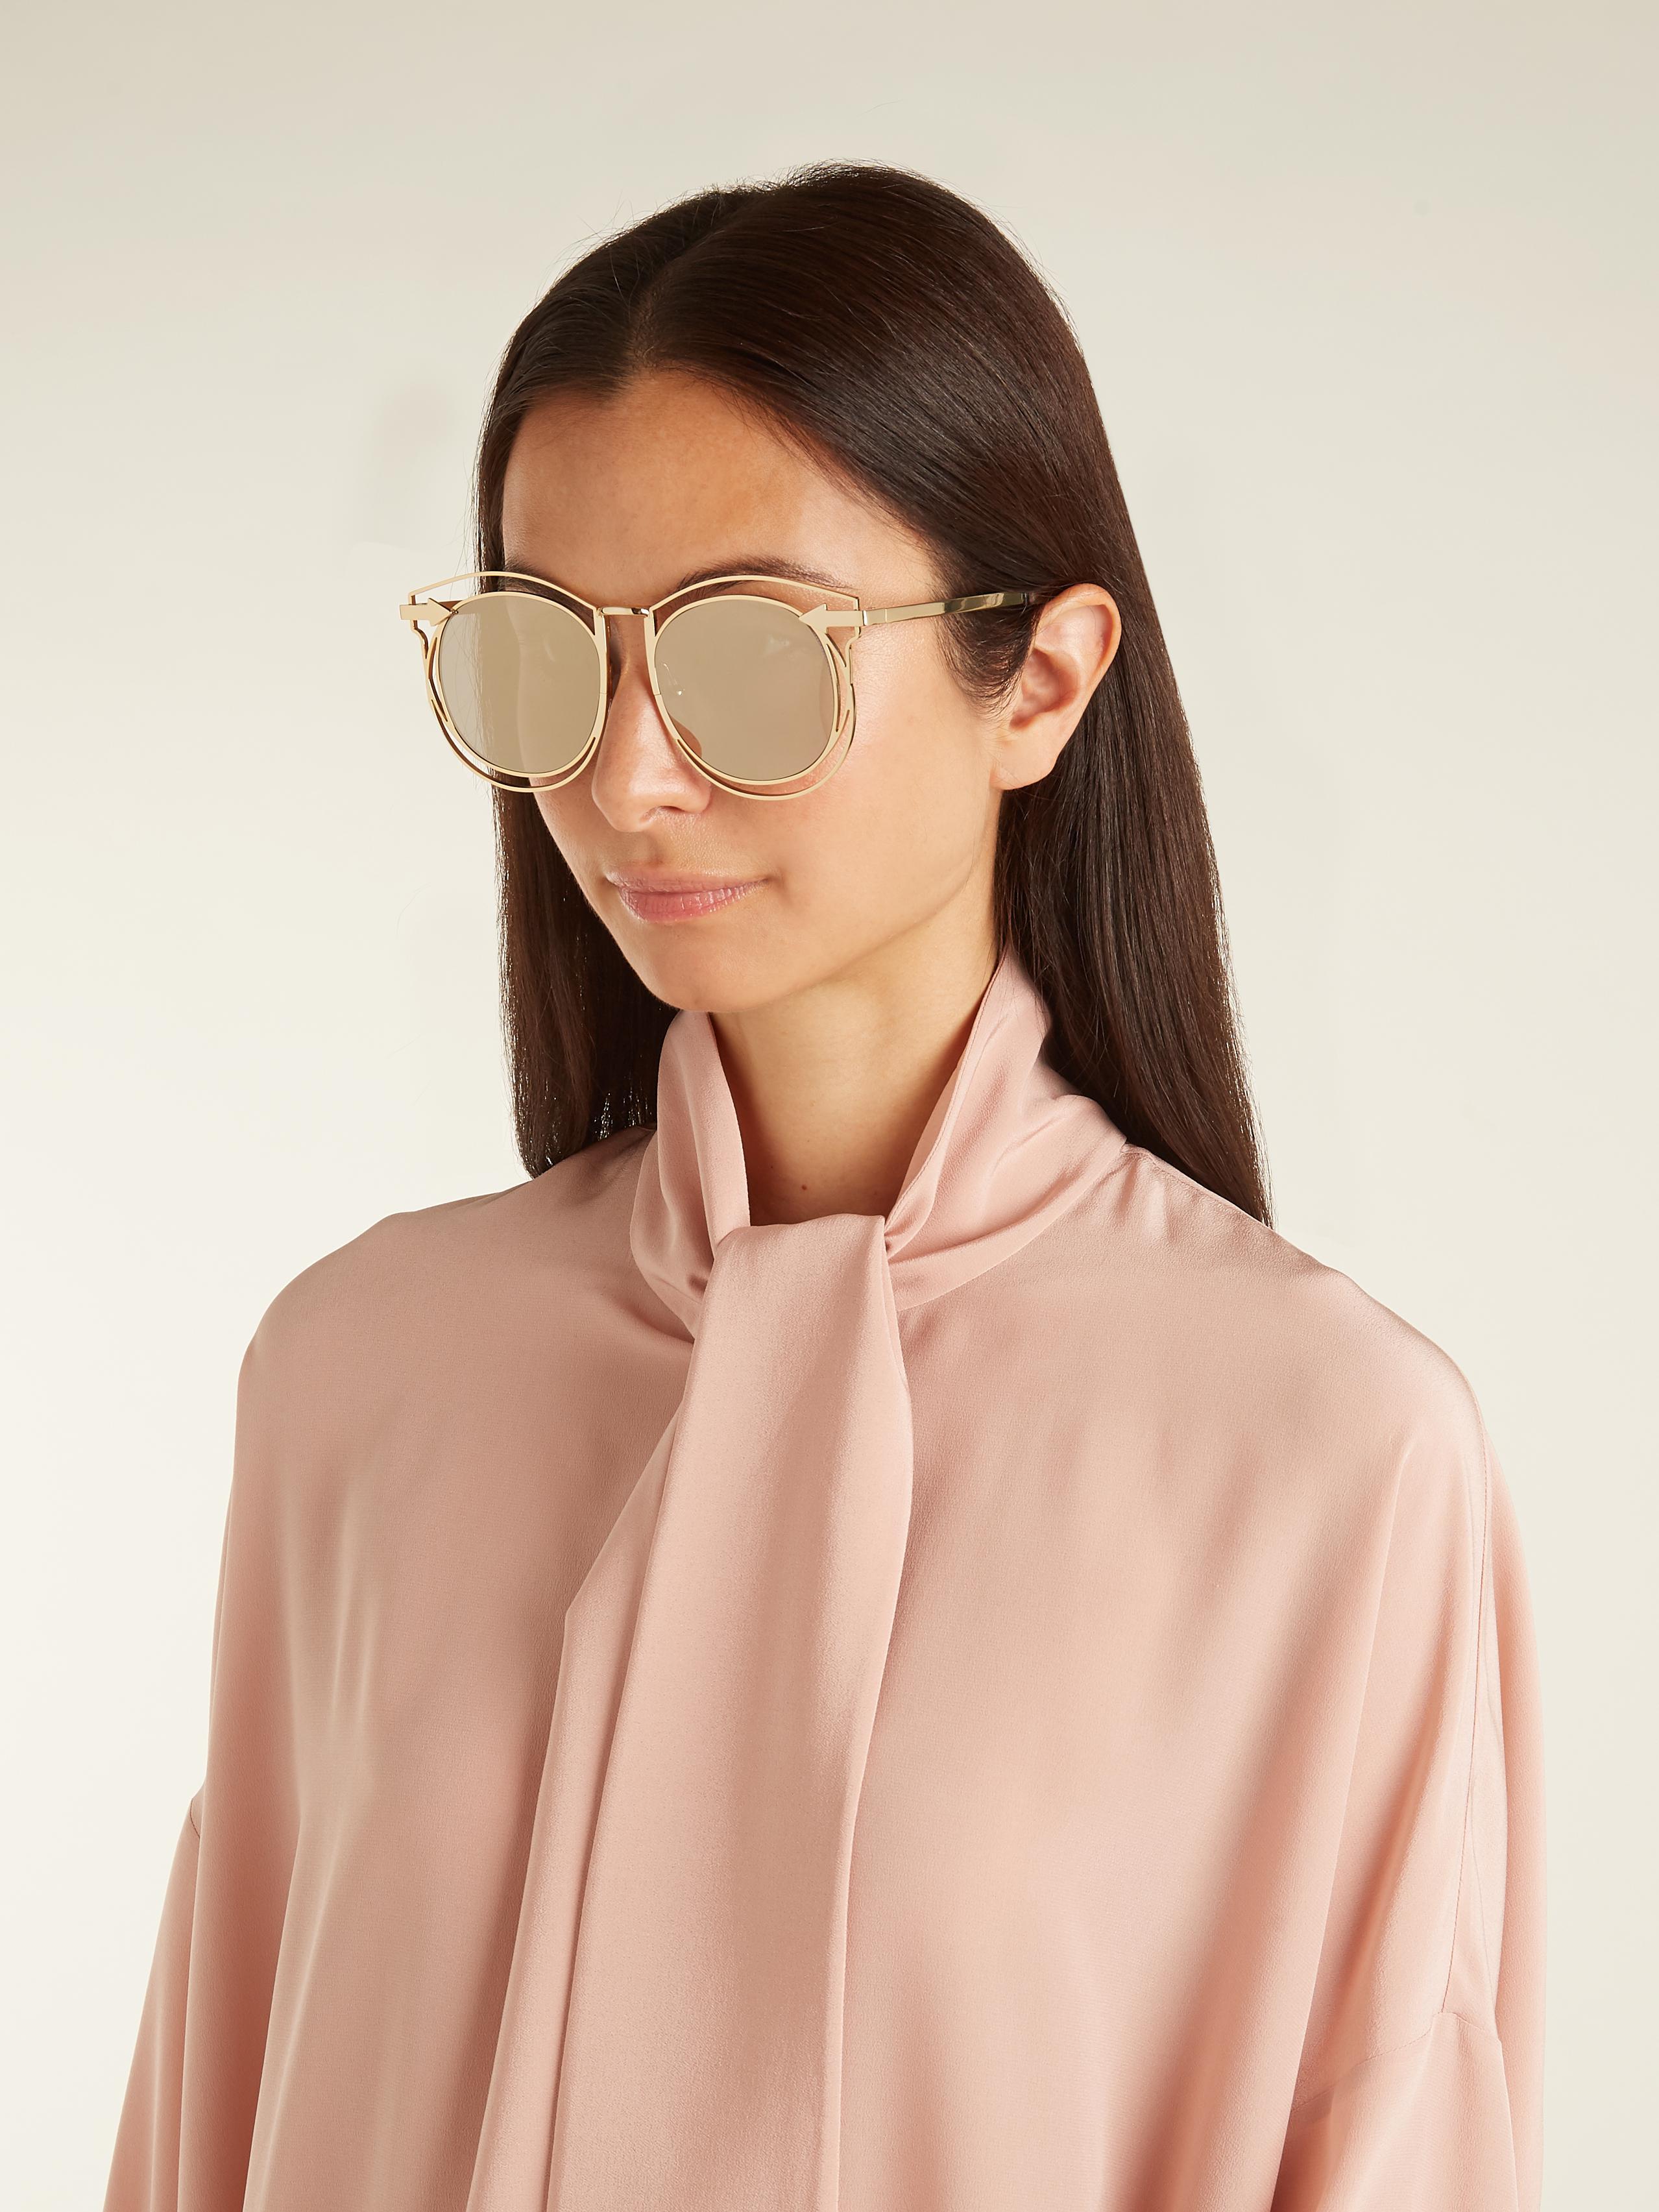 ad008d2f1db9d Karen Walker Simone Round-frame Sunglasses in Metallic - Lyst